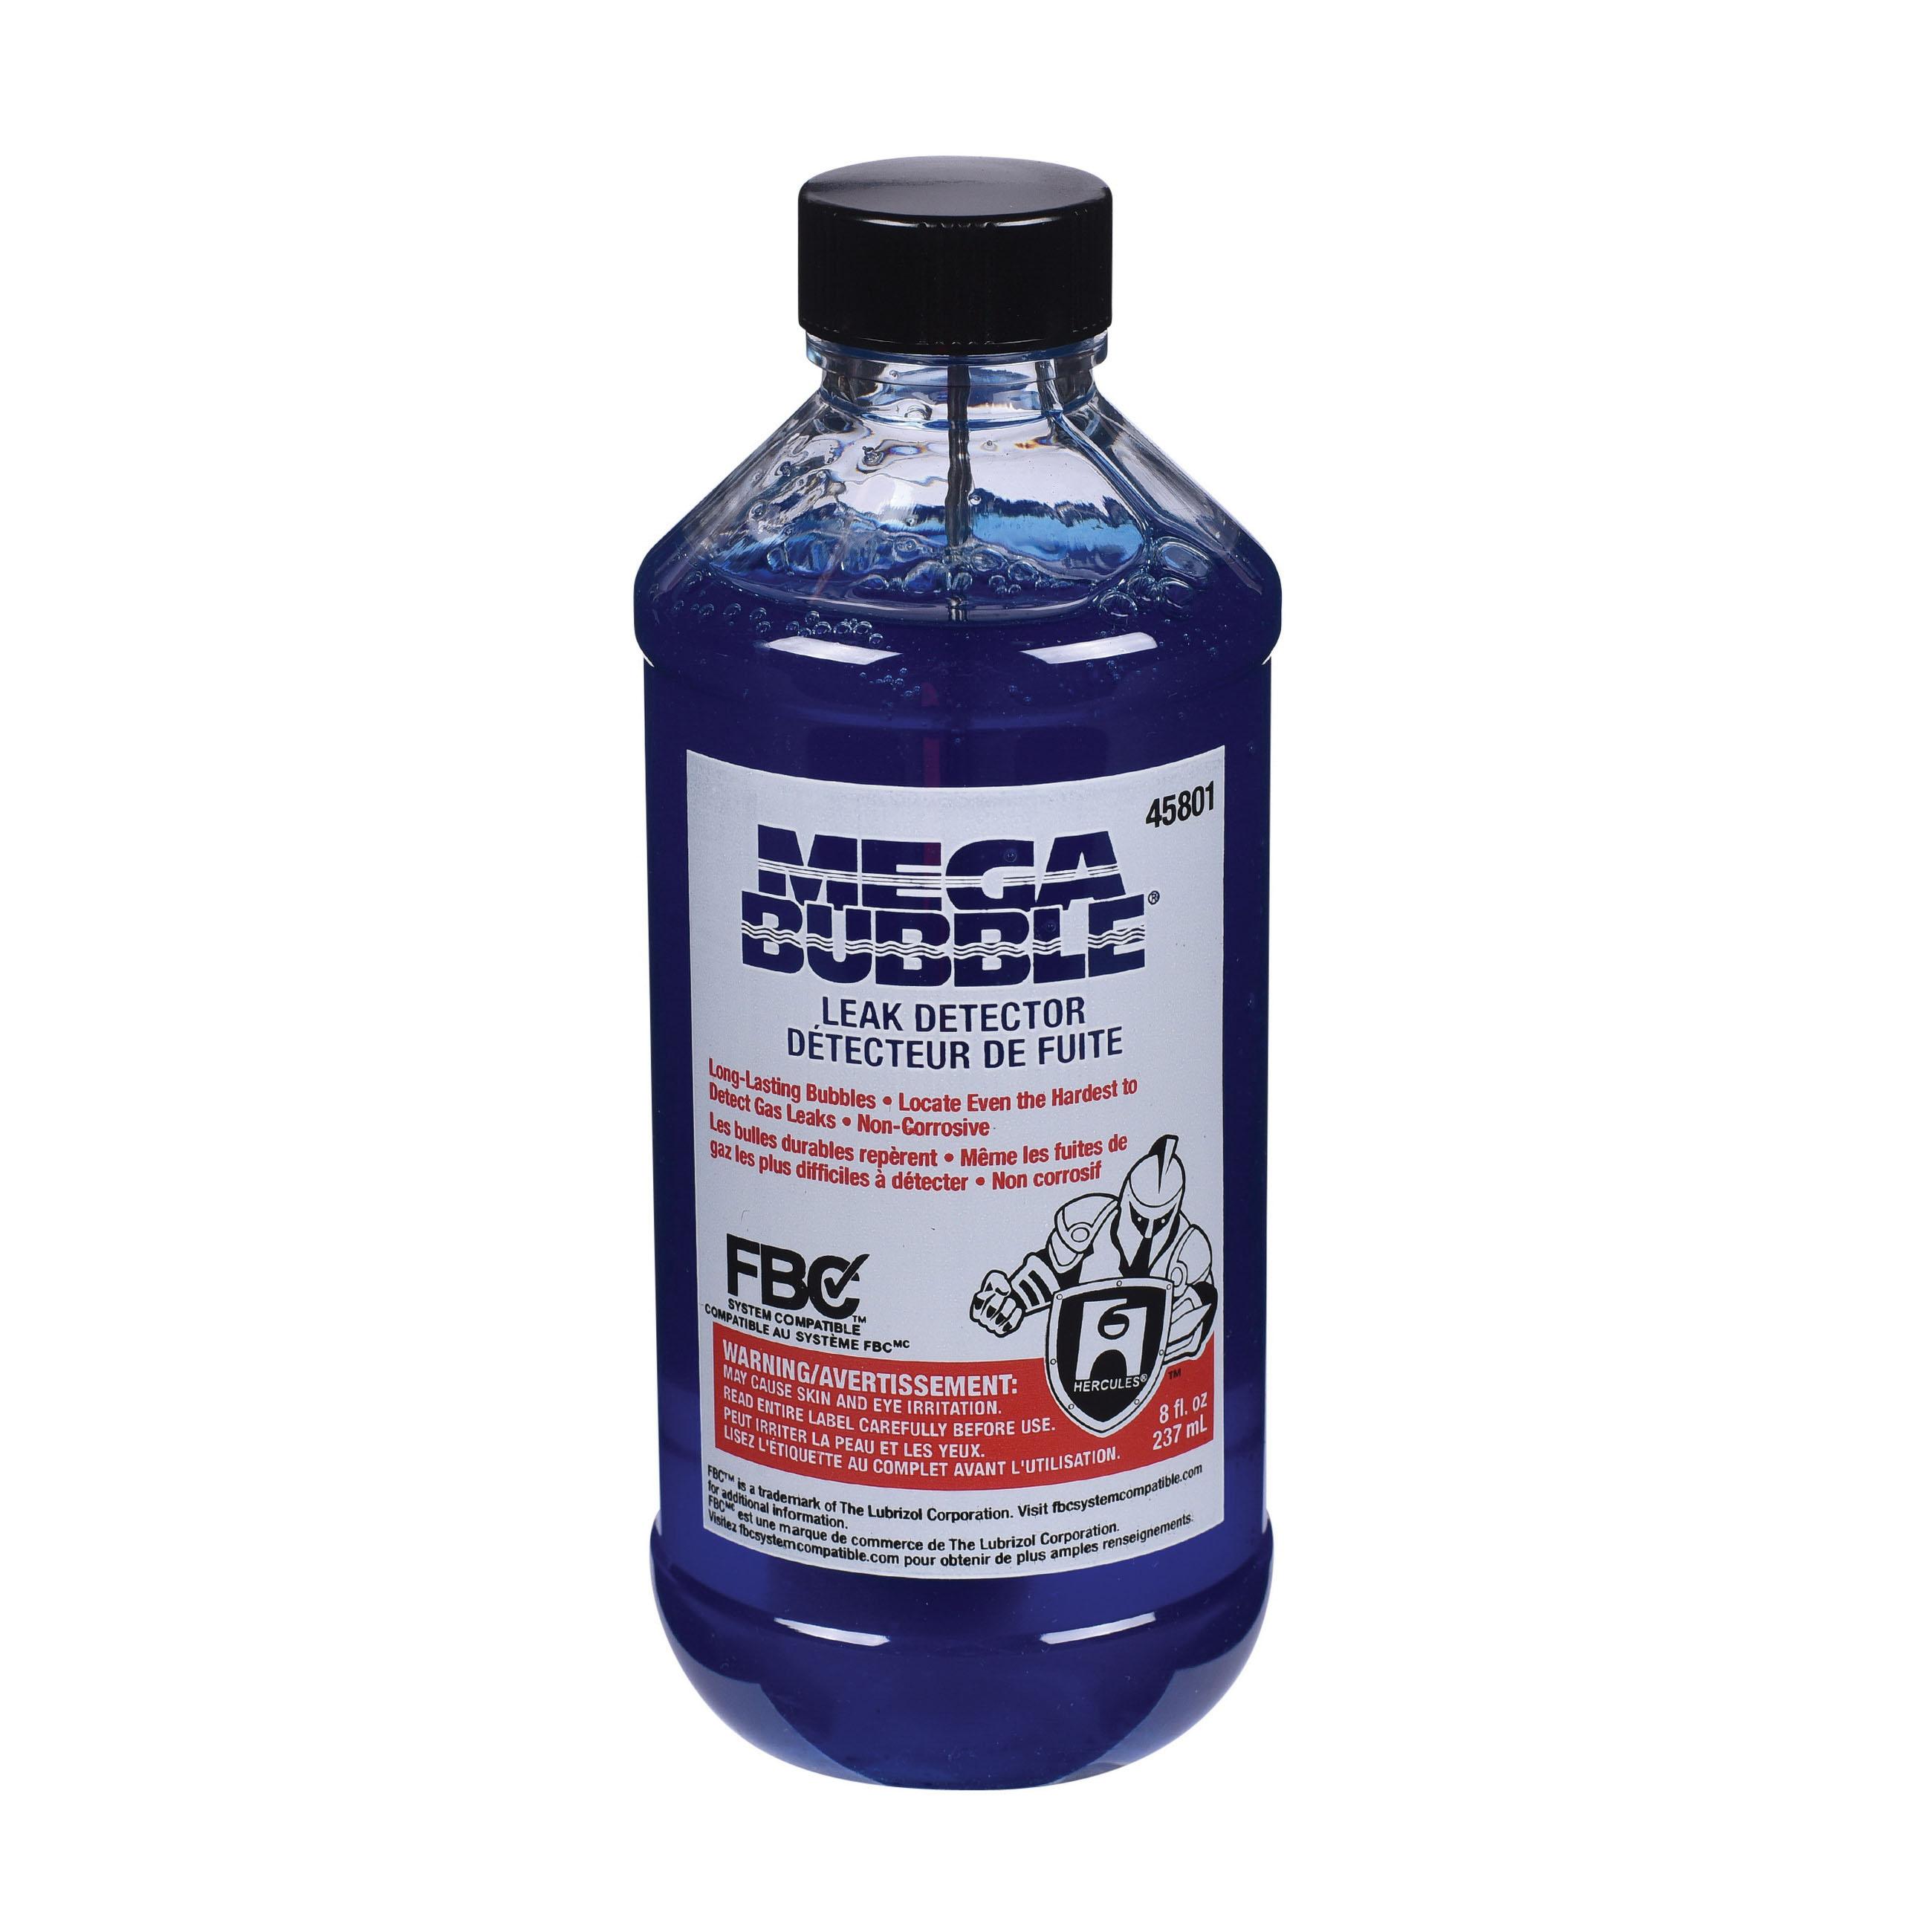 Hercules® MEGABUBBLE® 45801 Leak Detector, 0.5 pt Dauber Bottle, Blue